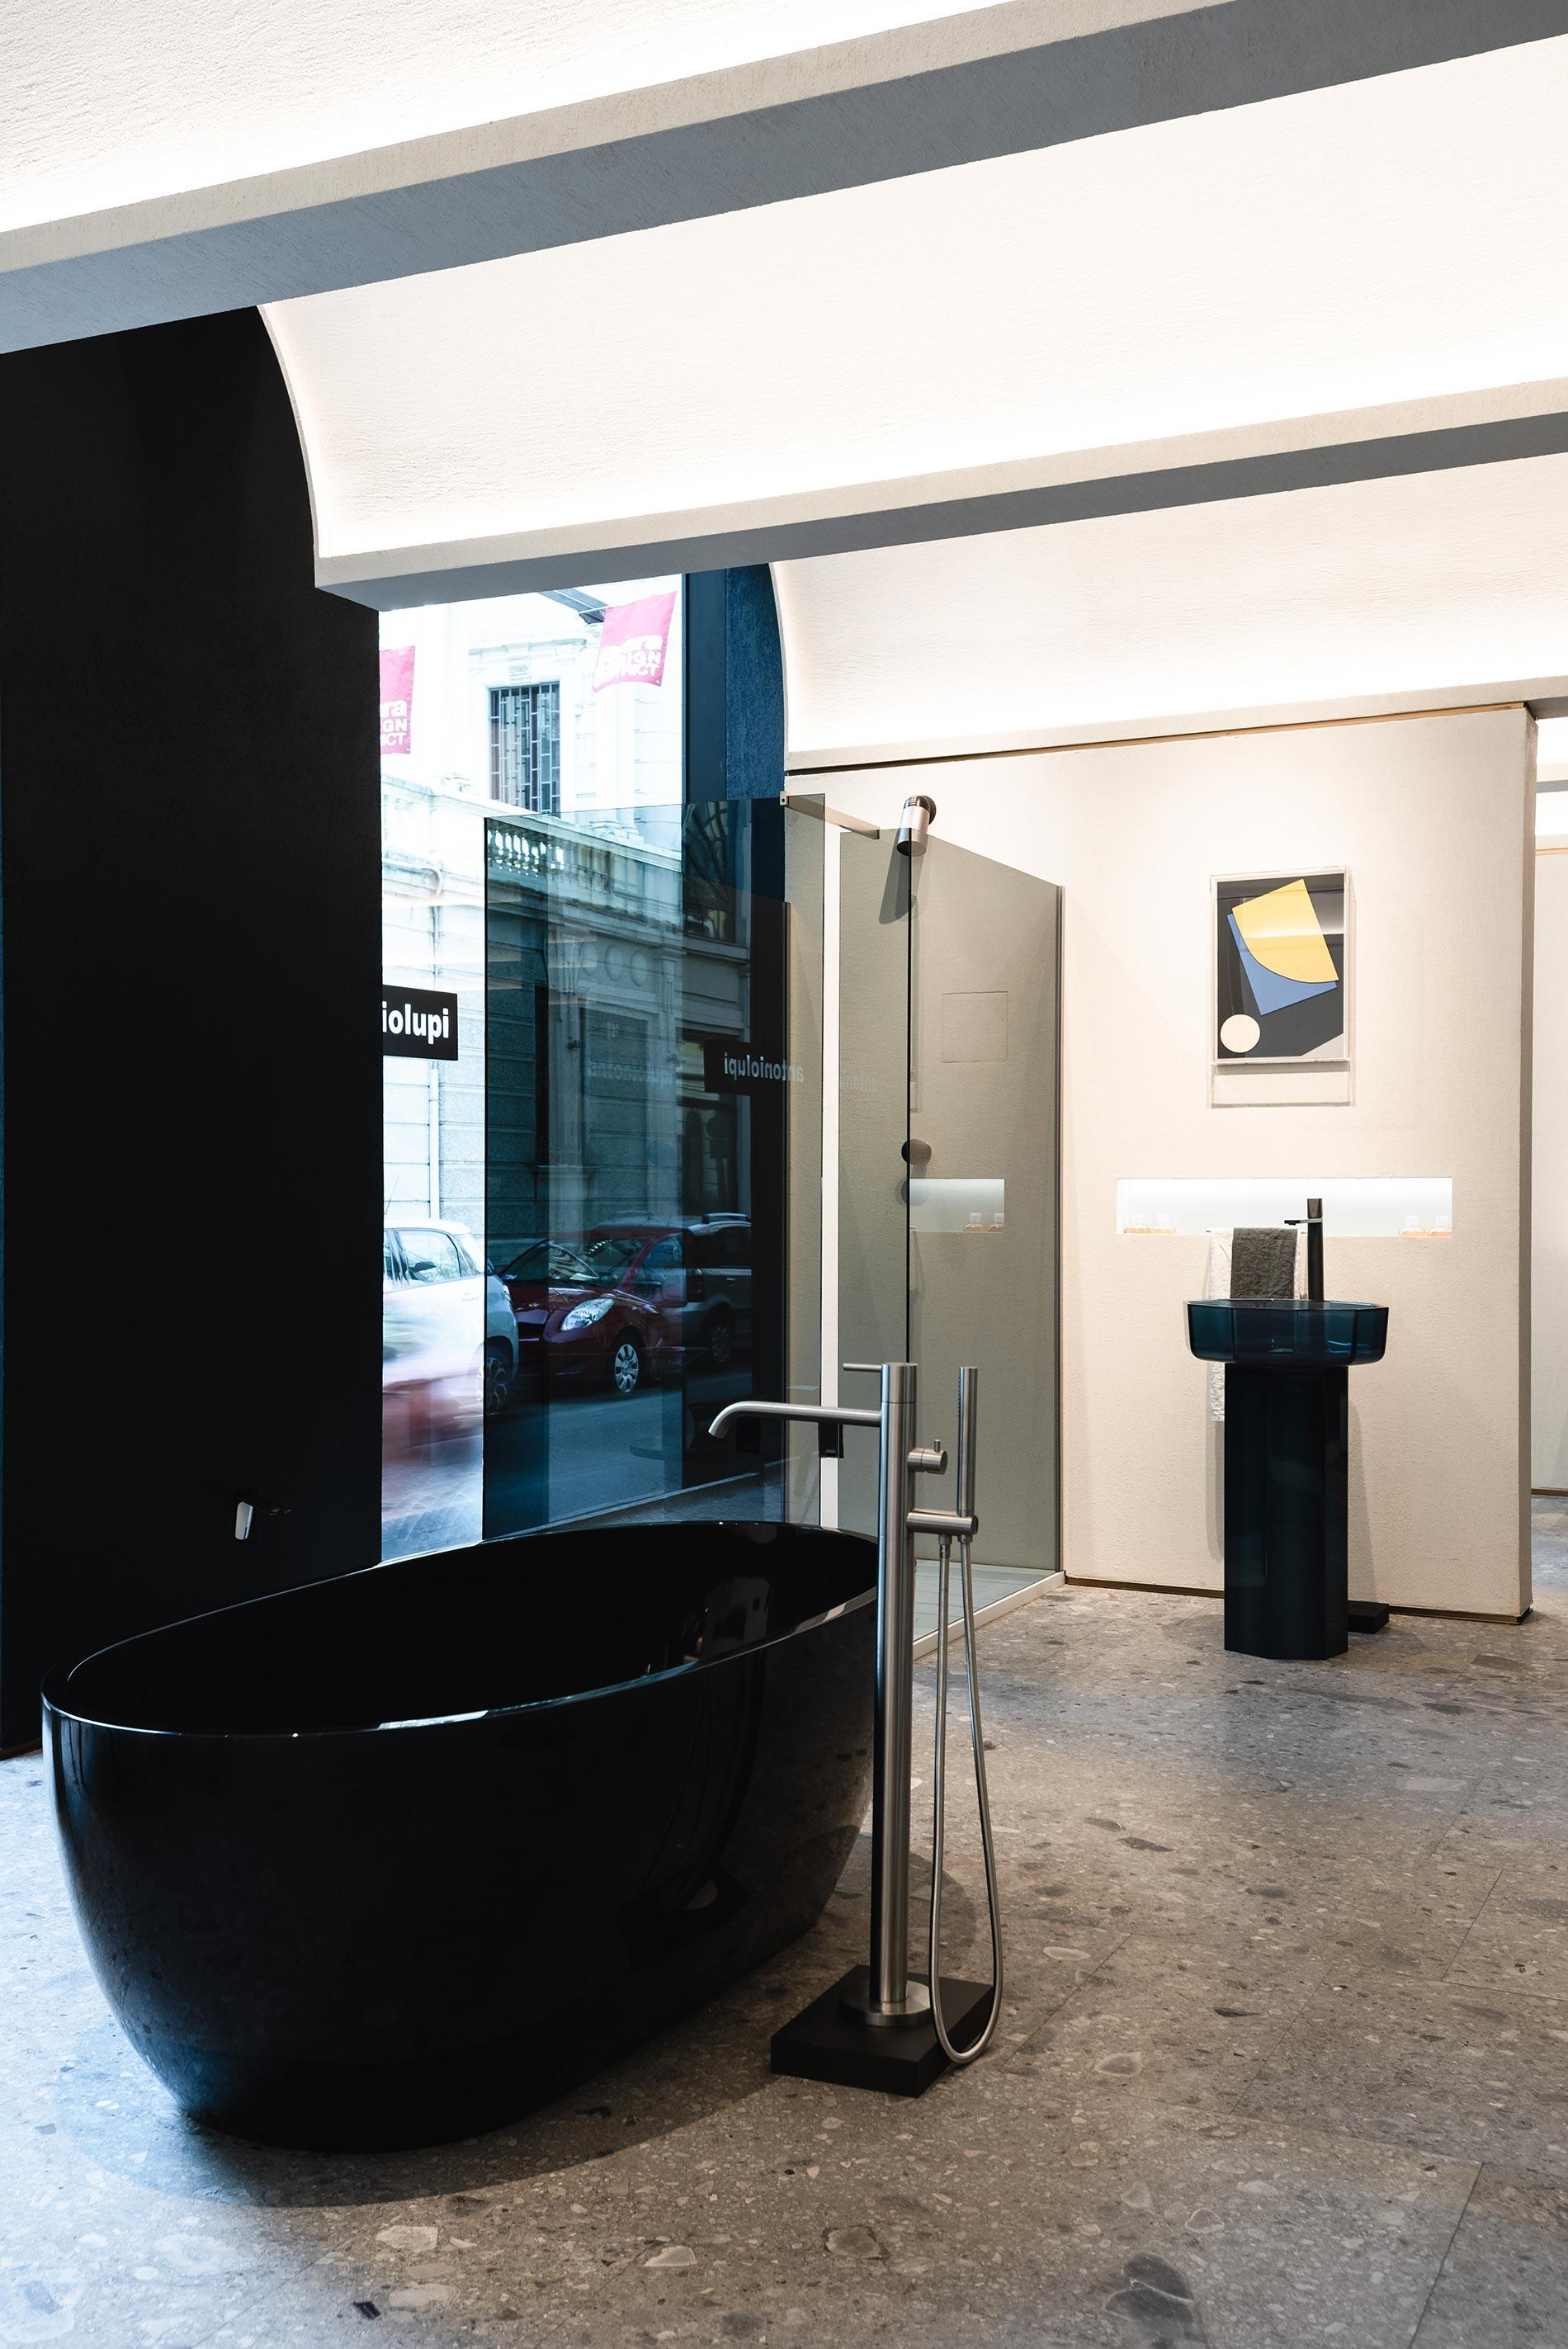 antoniolupi showroom milano arredobagno calvi brambilla